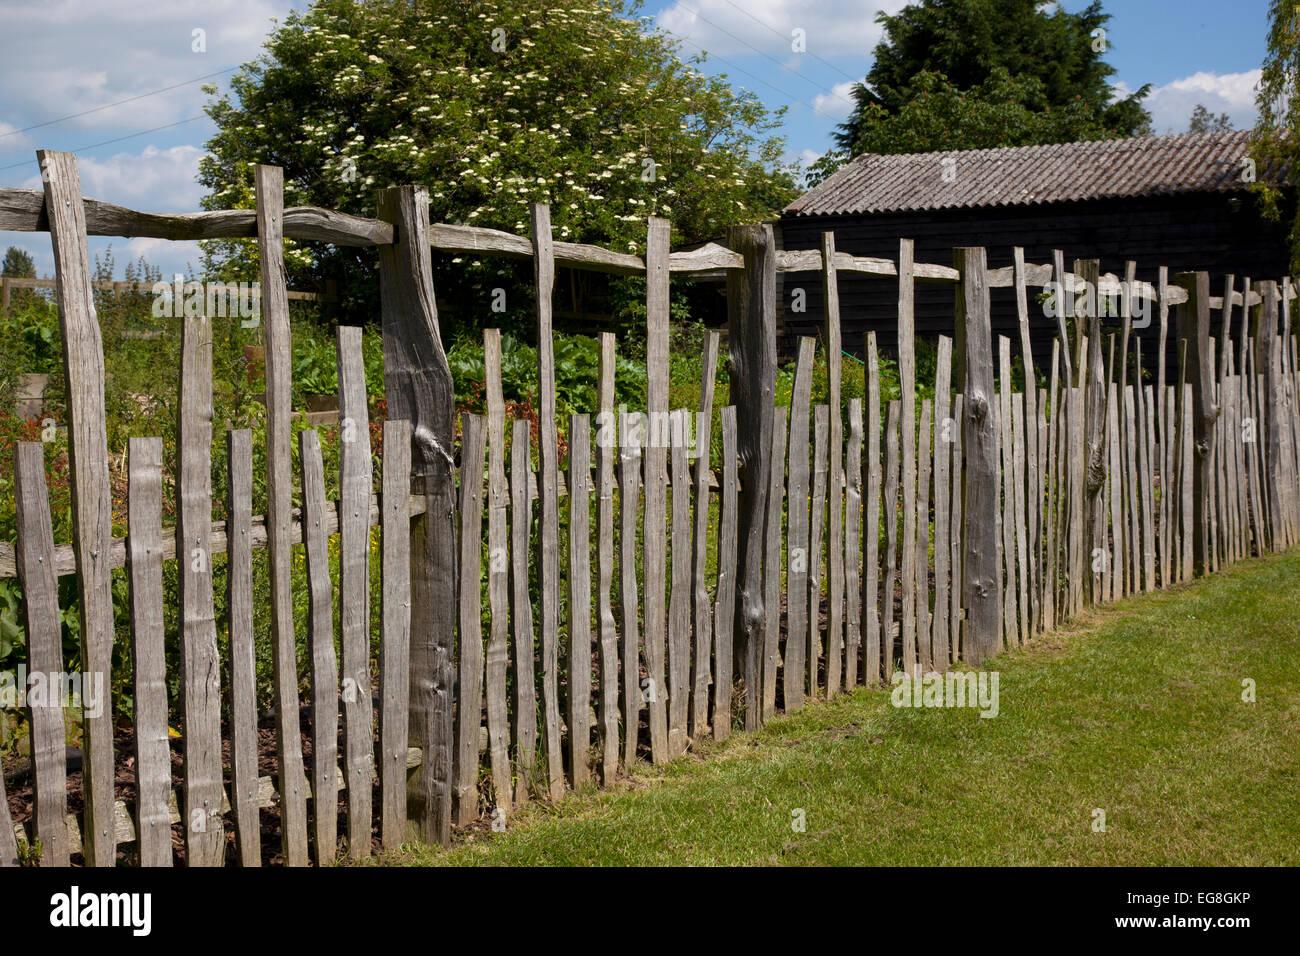 Rustikale Holz Spalt Fechten im englischen Landschaftsgarten, Oxfordshire, England Stockbild